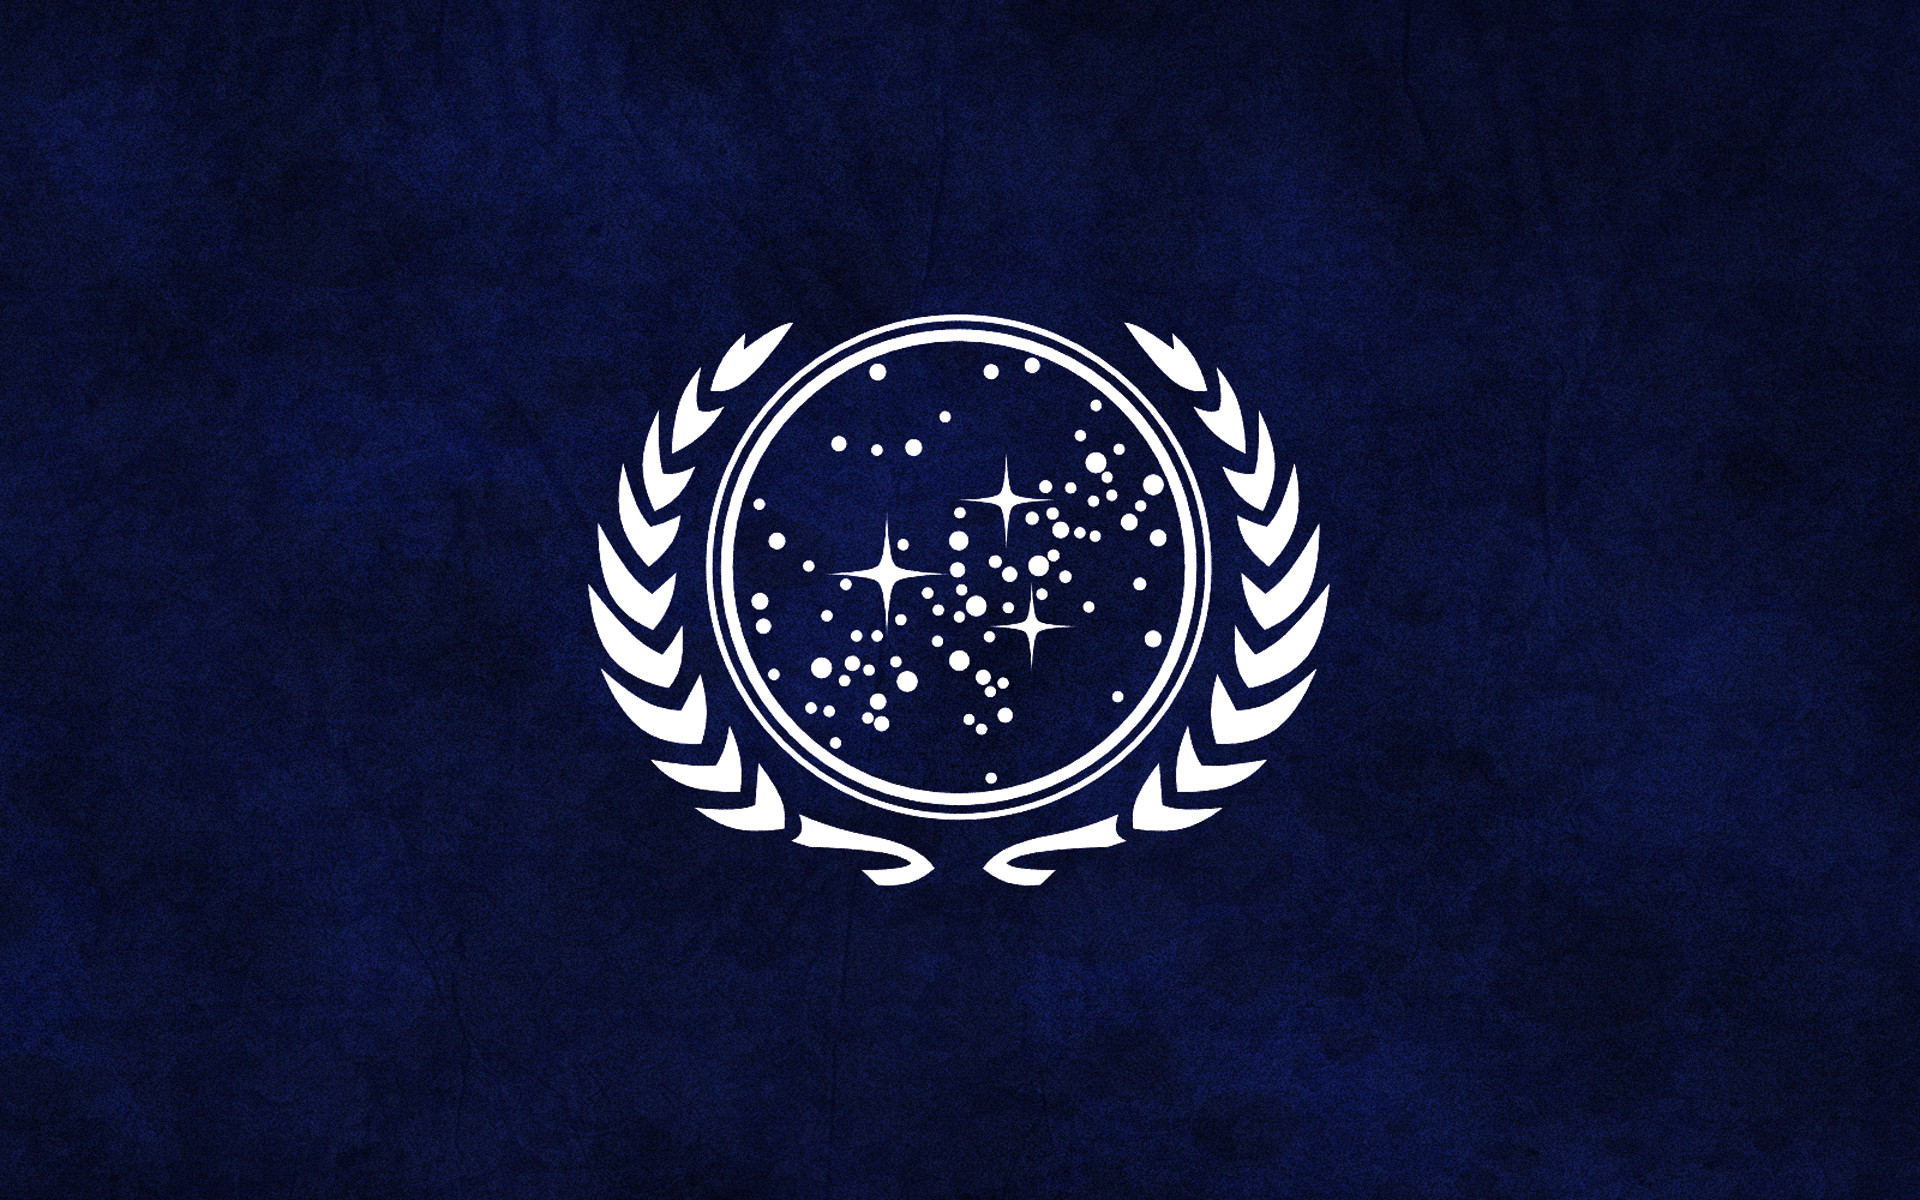 Starfleet Wallpaper by chadtalbot Starfleet Wallpaper by chadtalbot